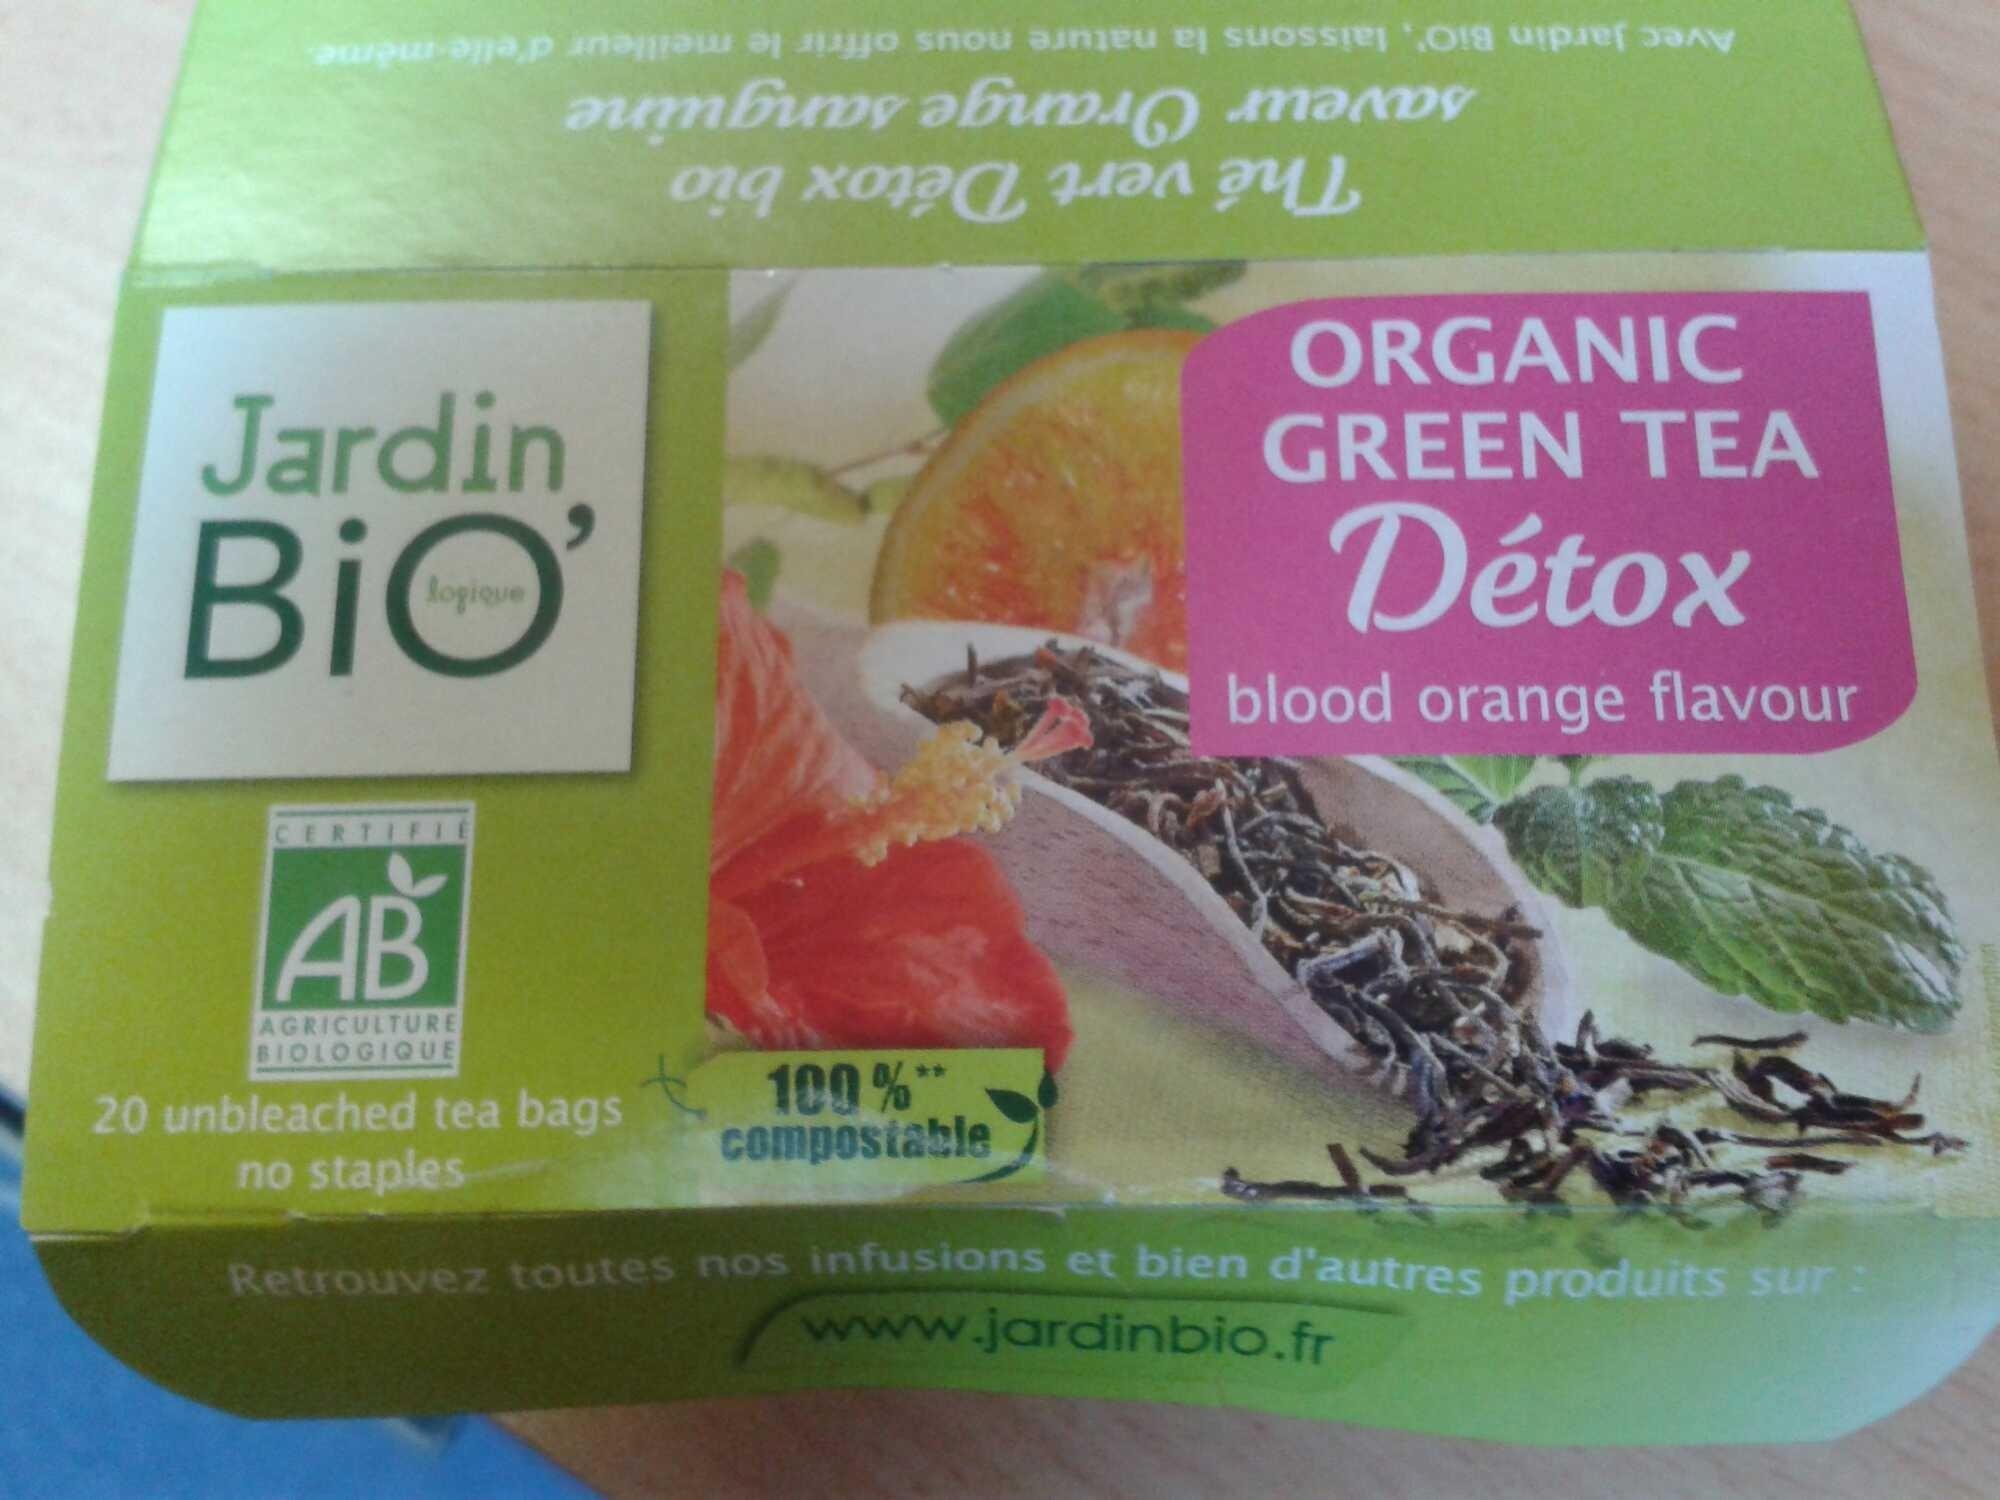 Thé Vert Detox Arôme Orange Sanguine - Jardin Bio - 30 G avec Jardin Bio Infusion